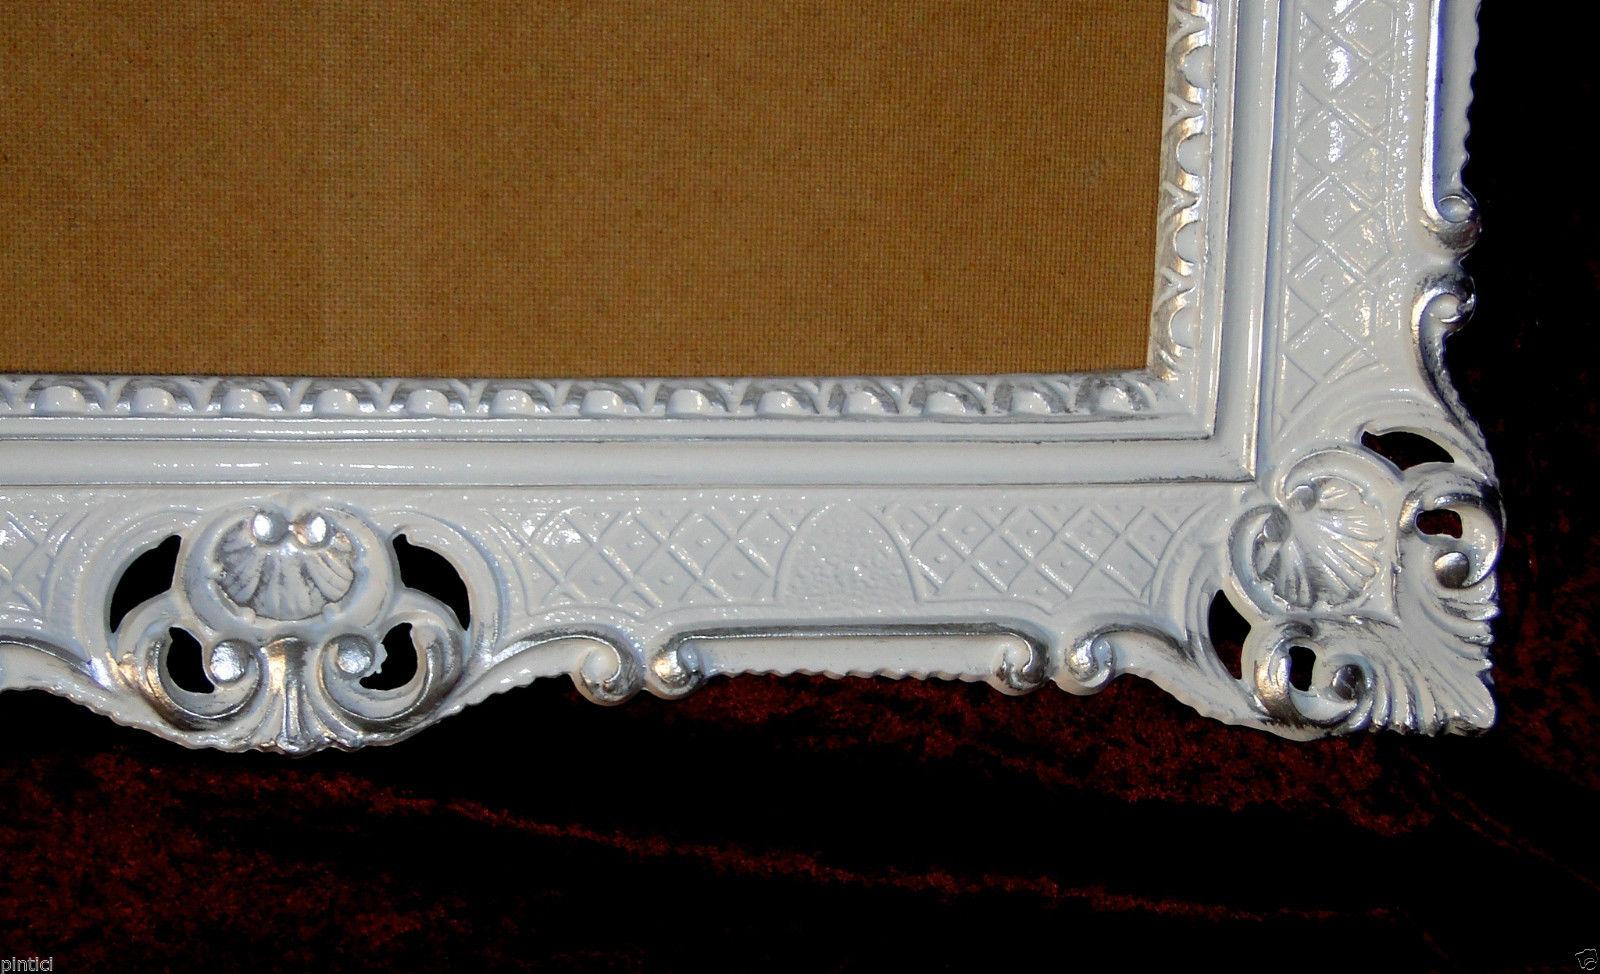 bilderrahmen barock wei silber hochzeitsrahmen antik. Black Bedroom Furniture Sets. Home Design Ideas